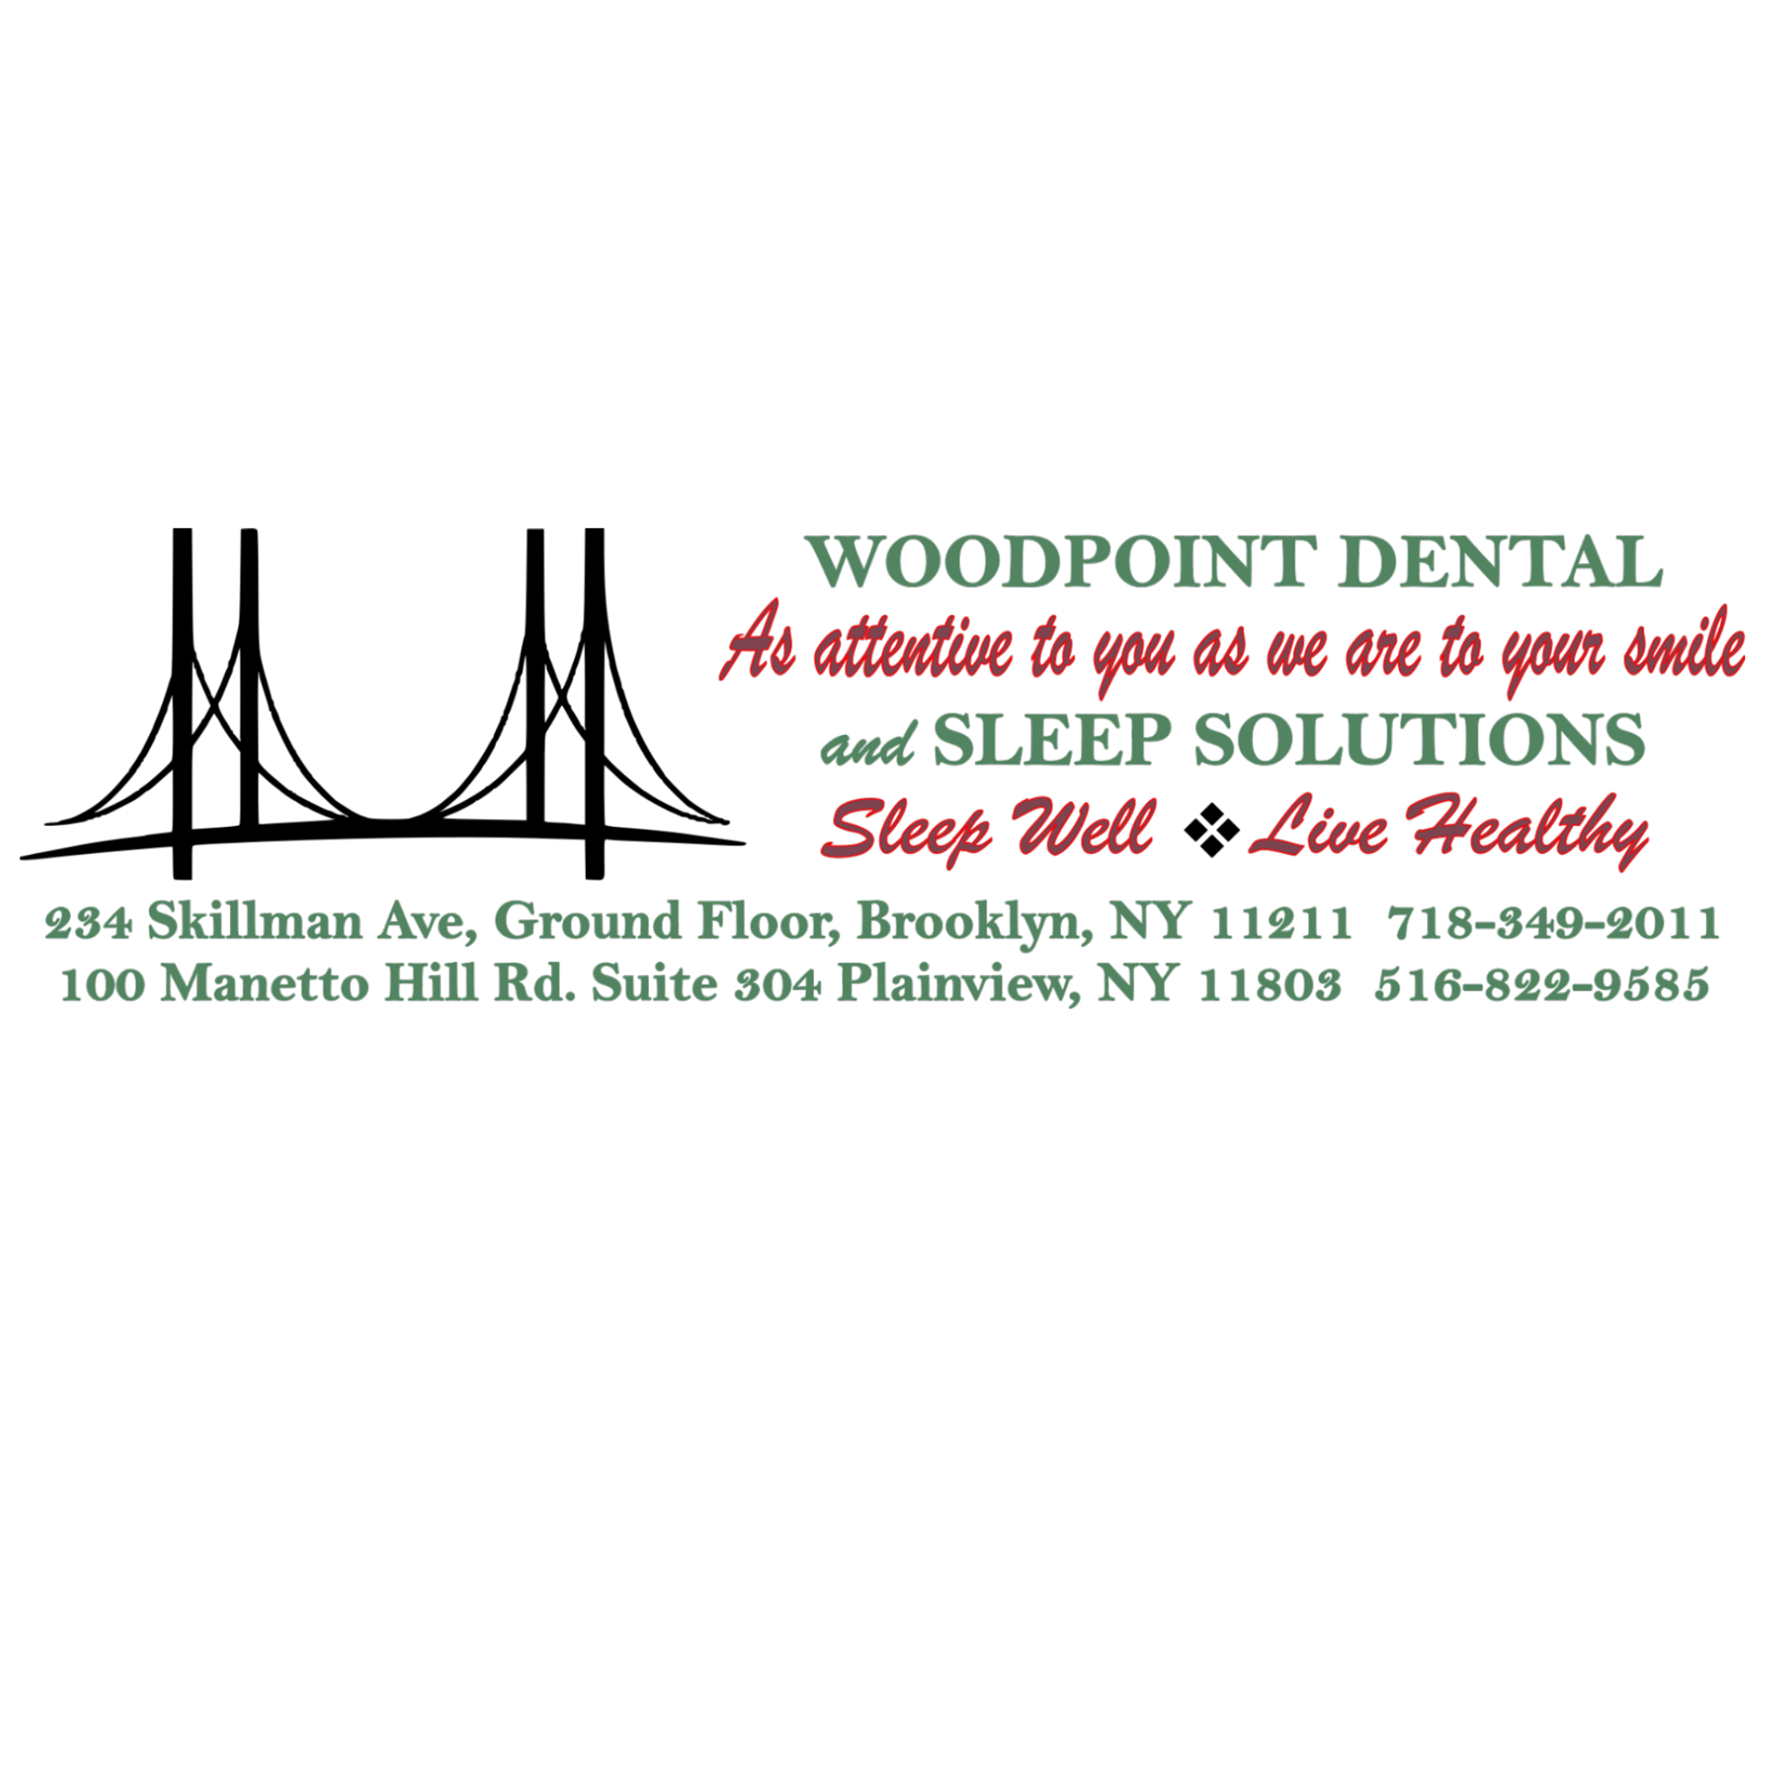 Woodpoint Dental